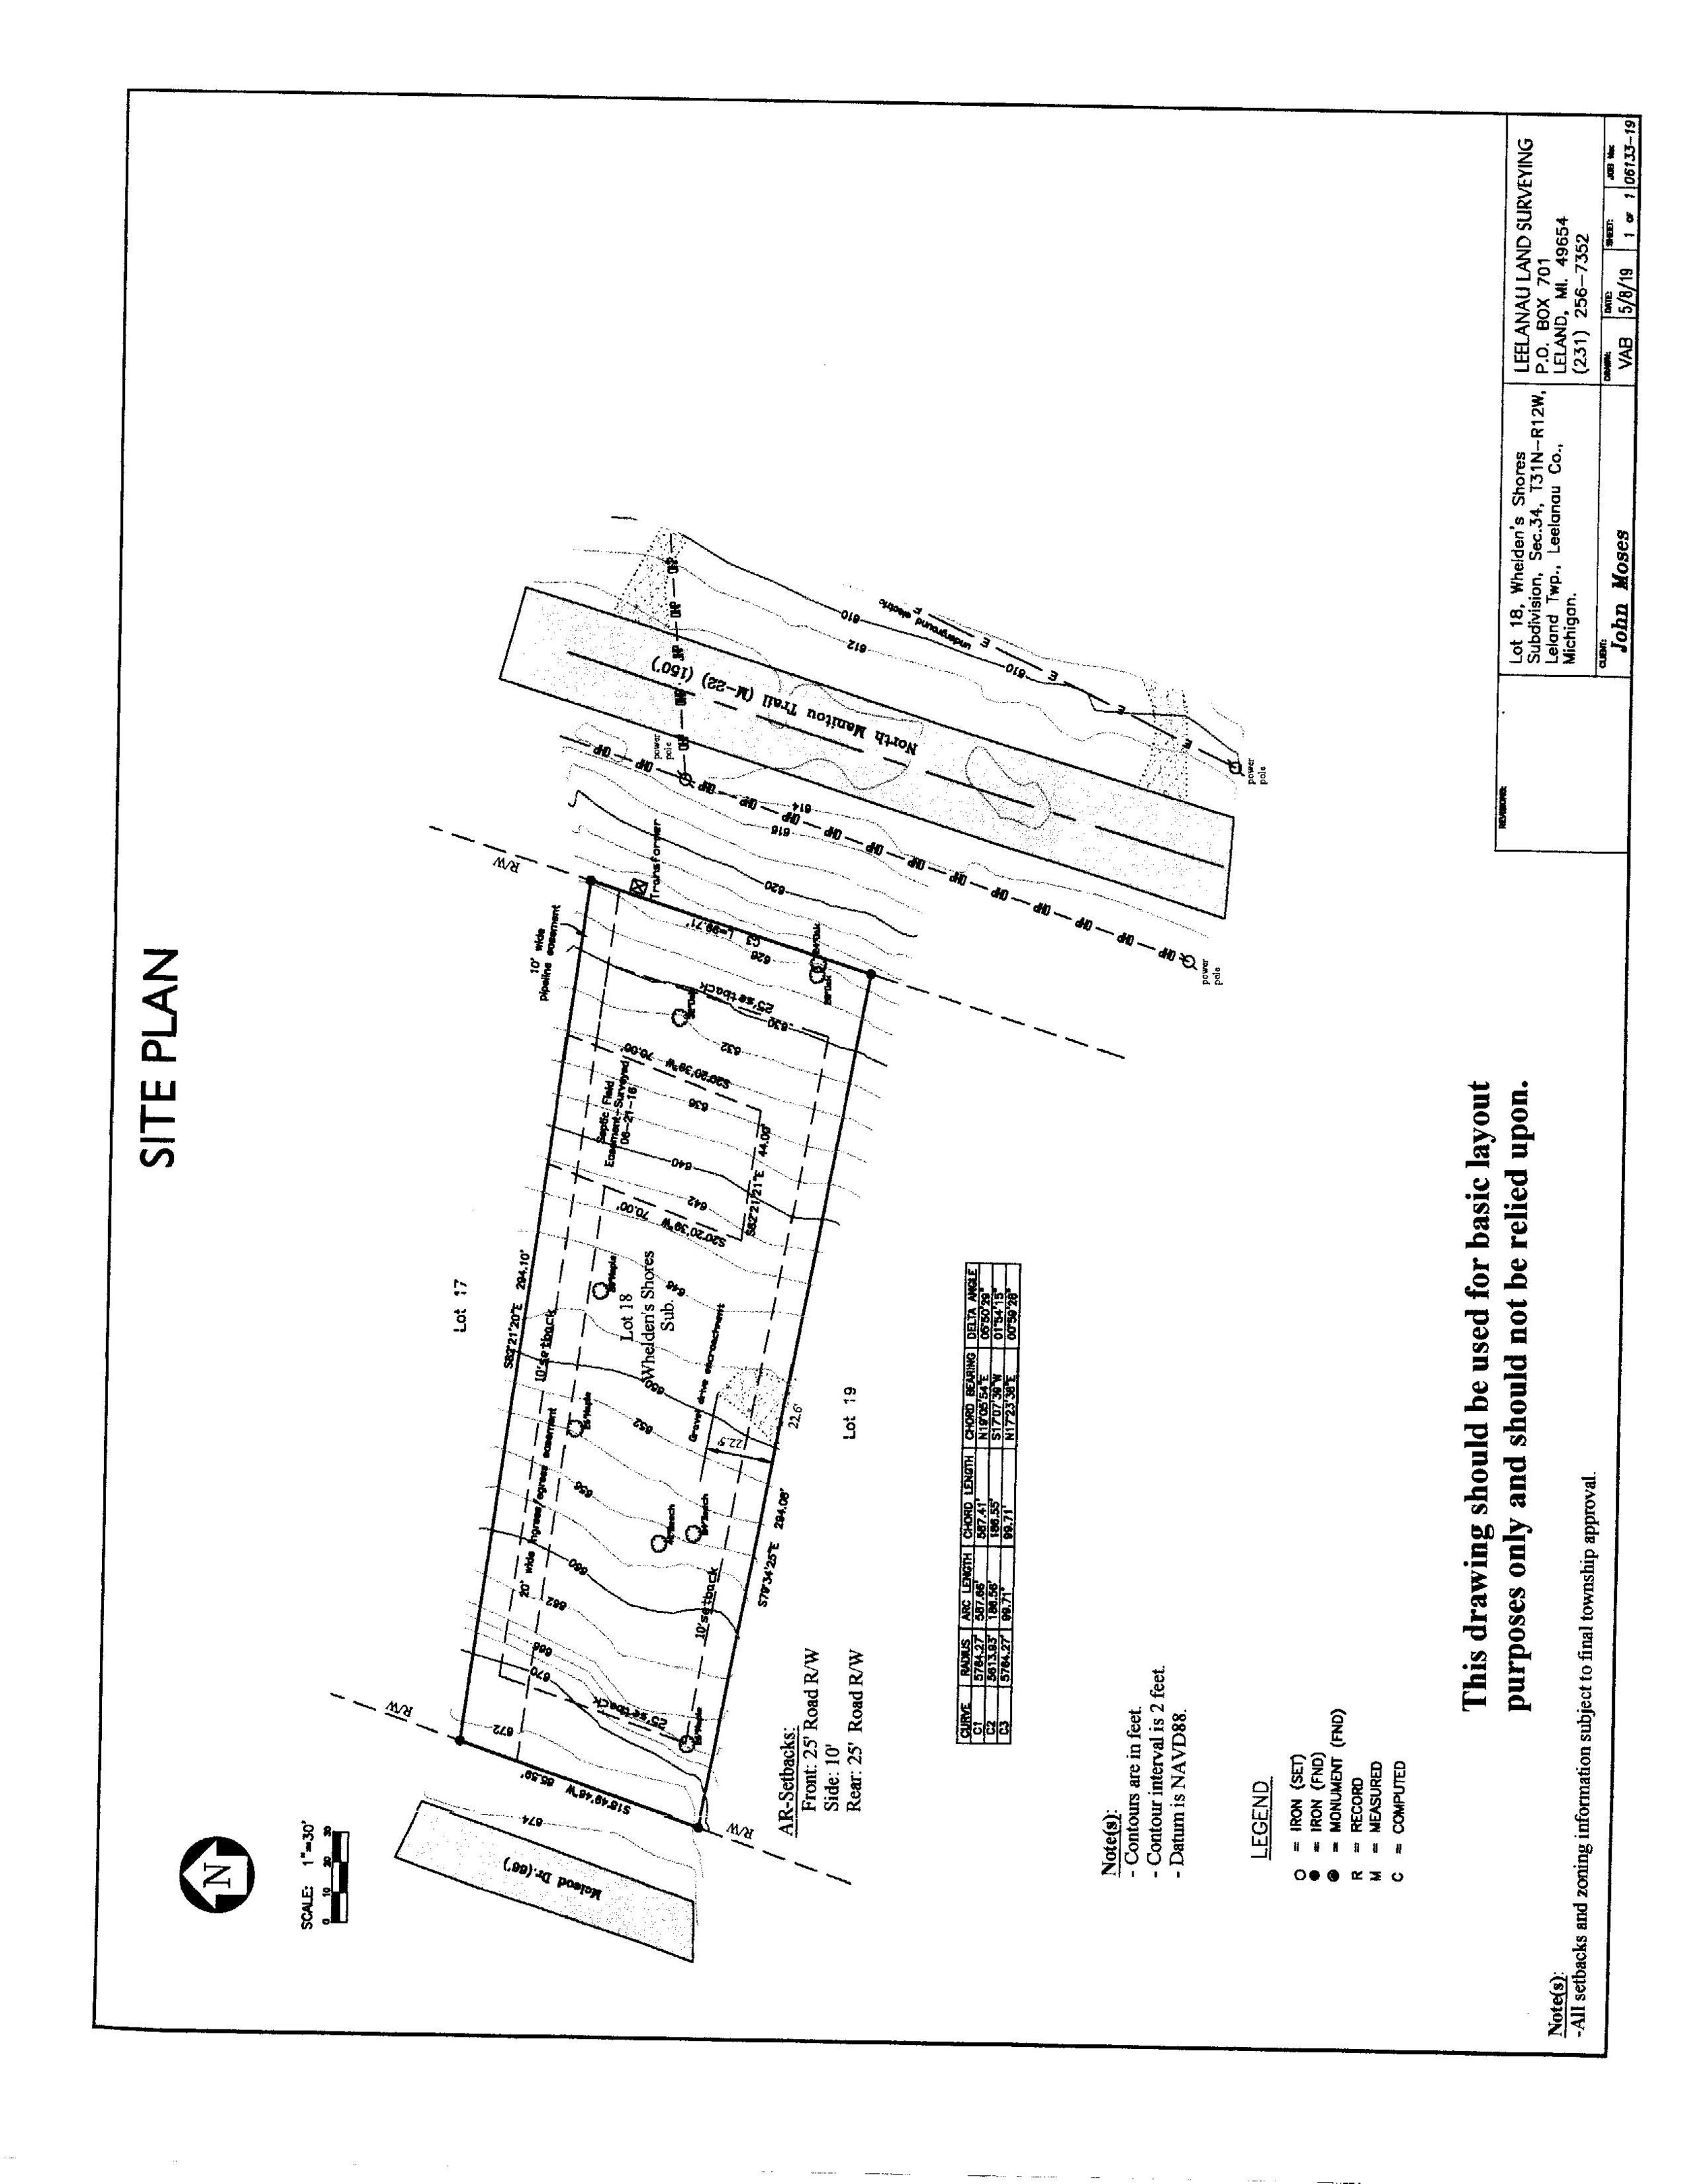 4388 N Manitou Trail, Leland - Marketing packet by Oltersdorf Realty LLC (16).jpg